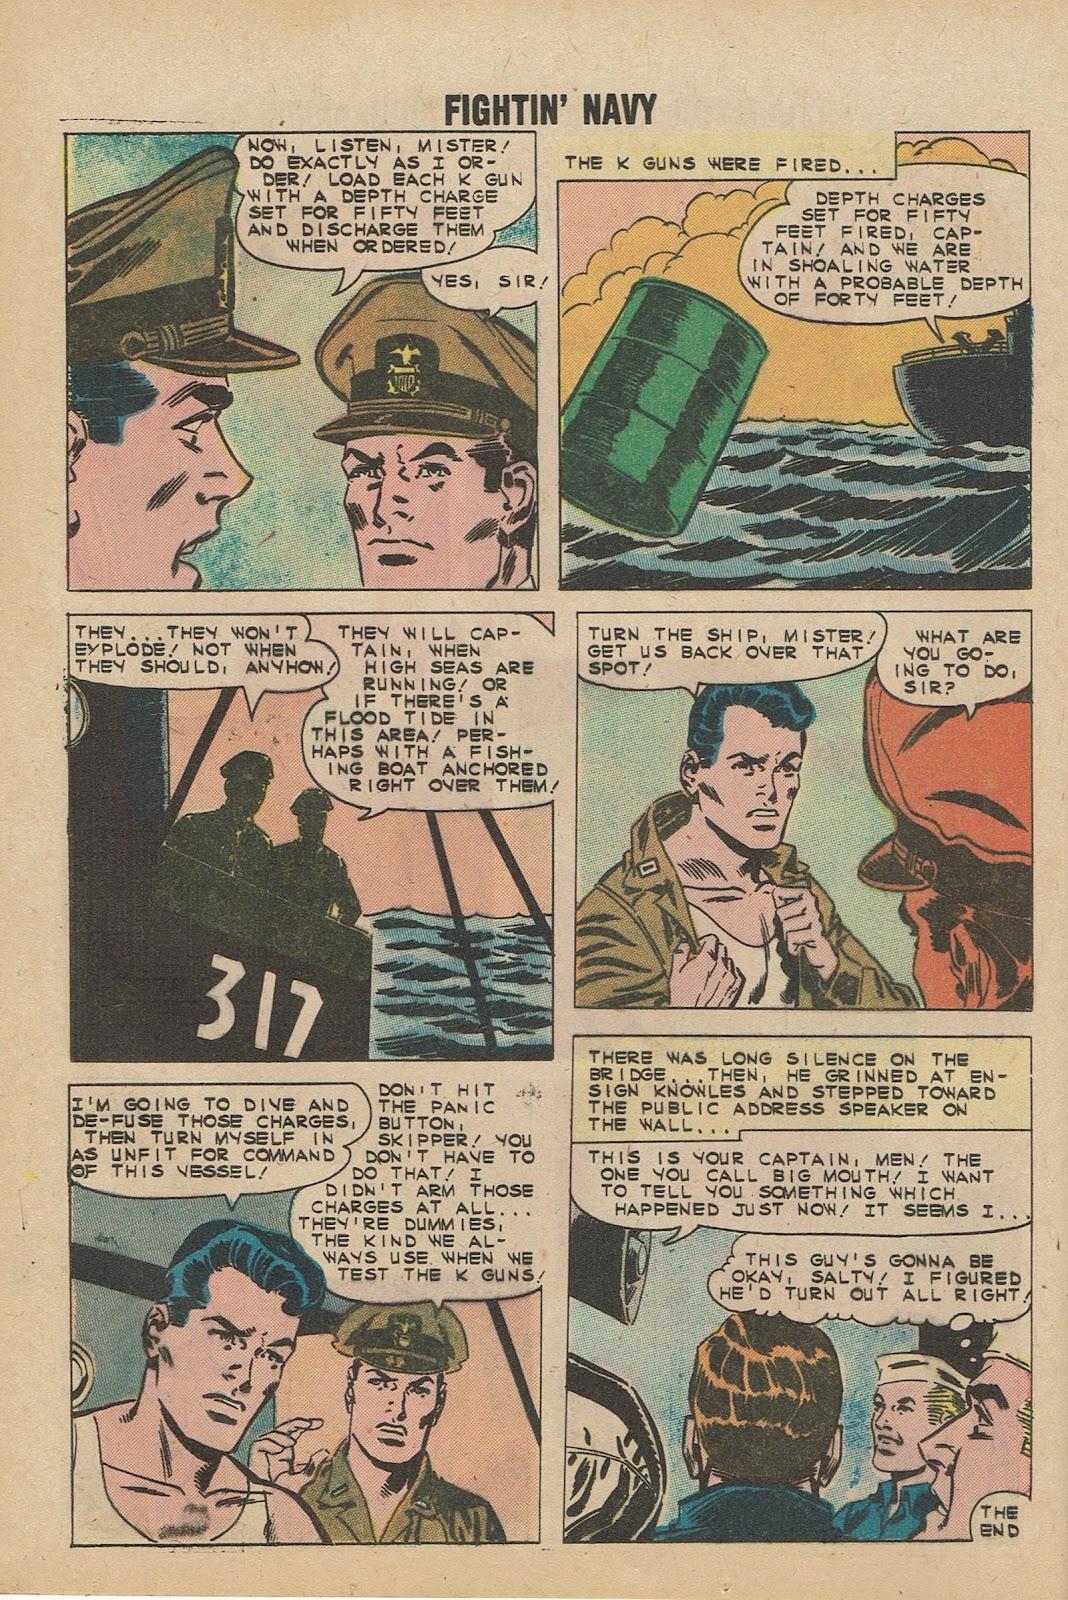 Read online Fightin' Navy comic -  Issue #98 - 24